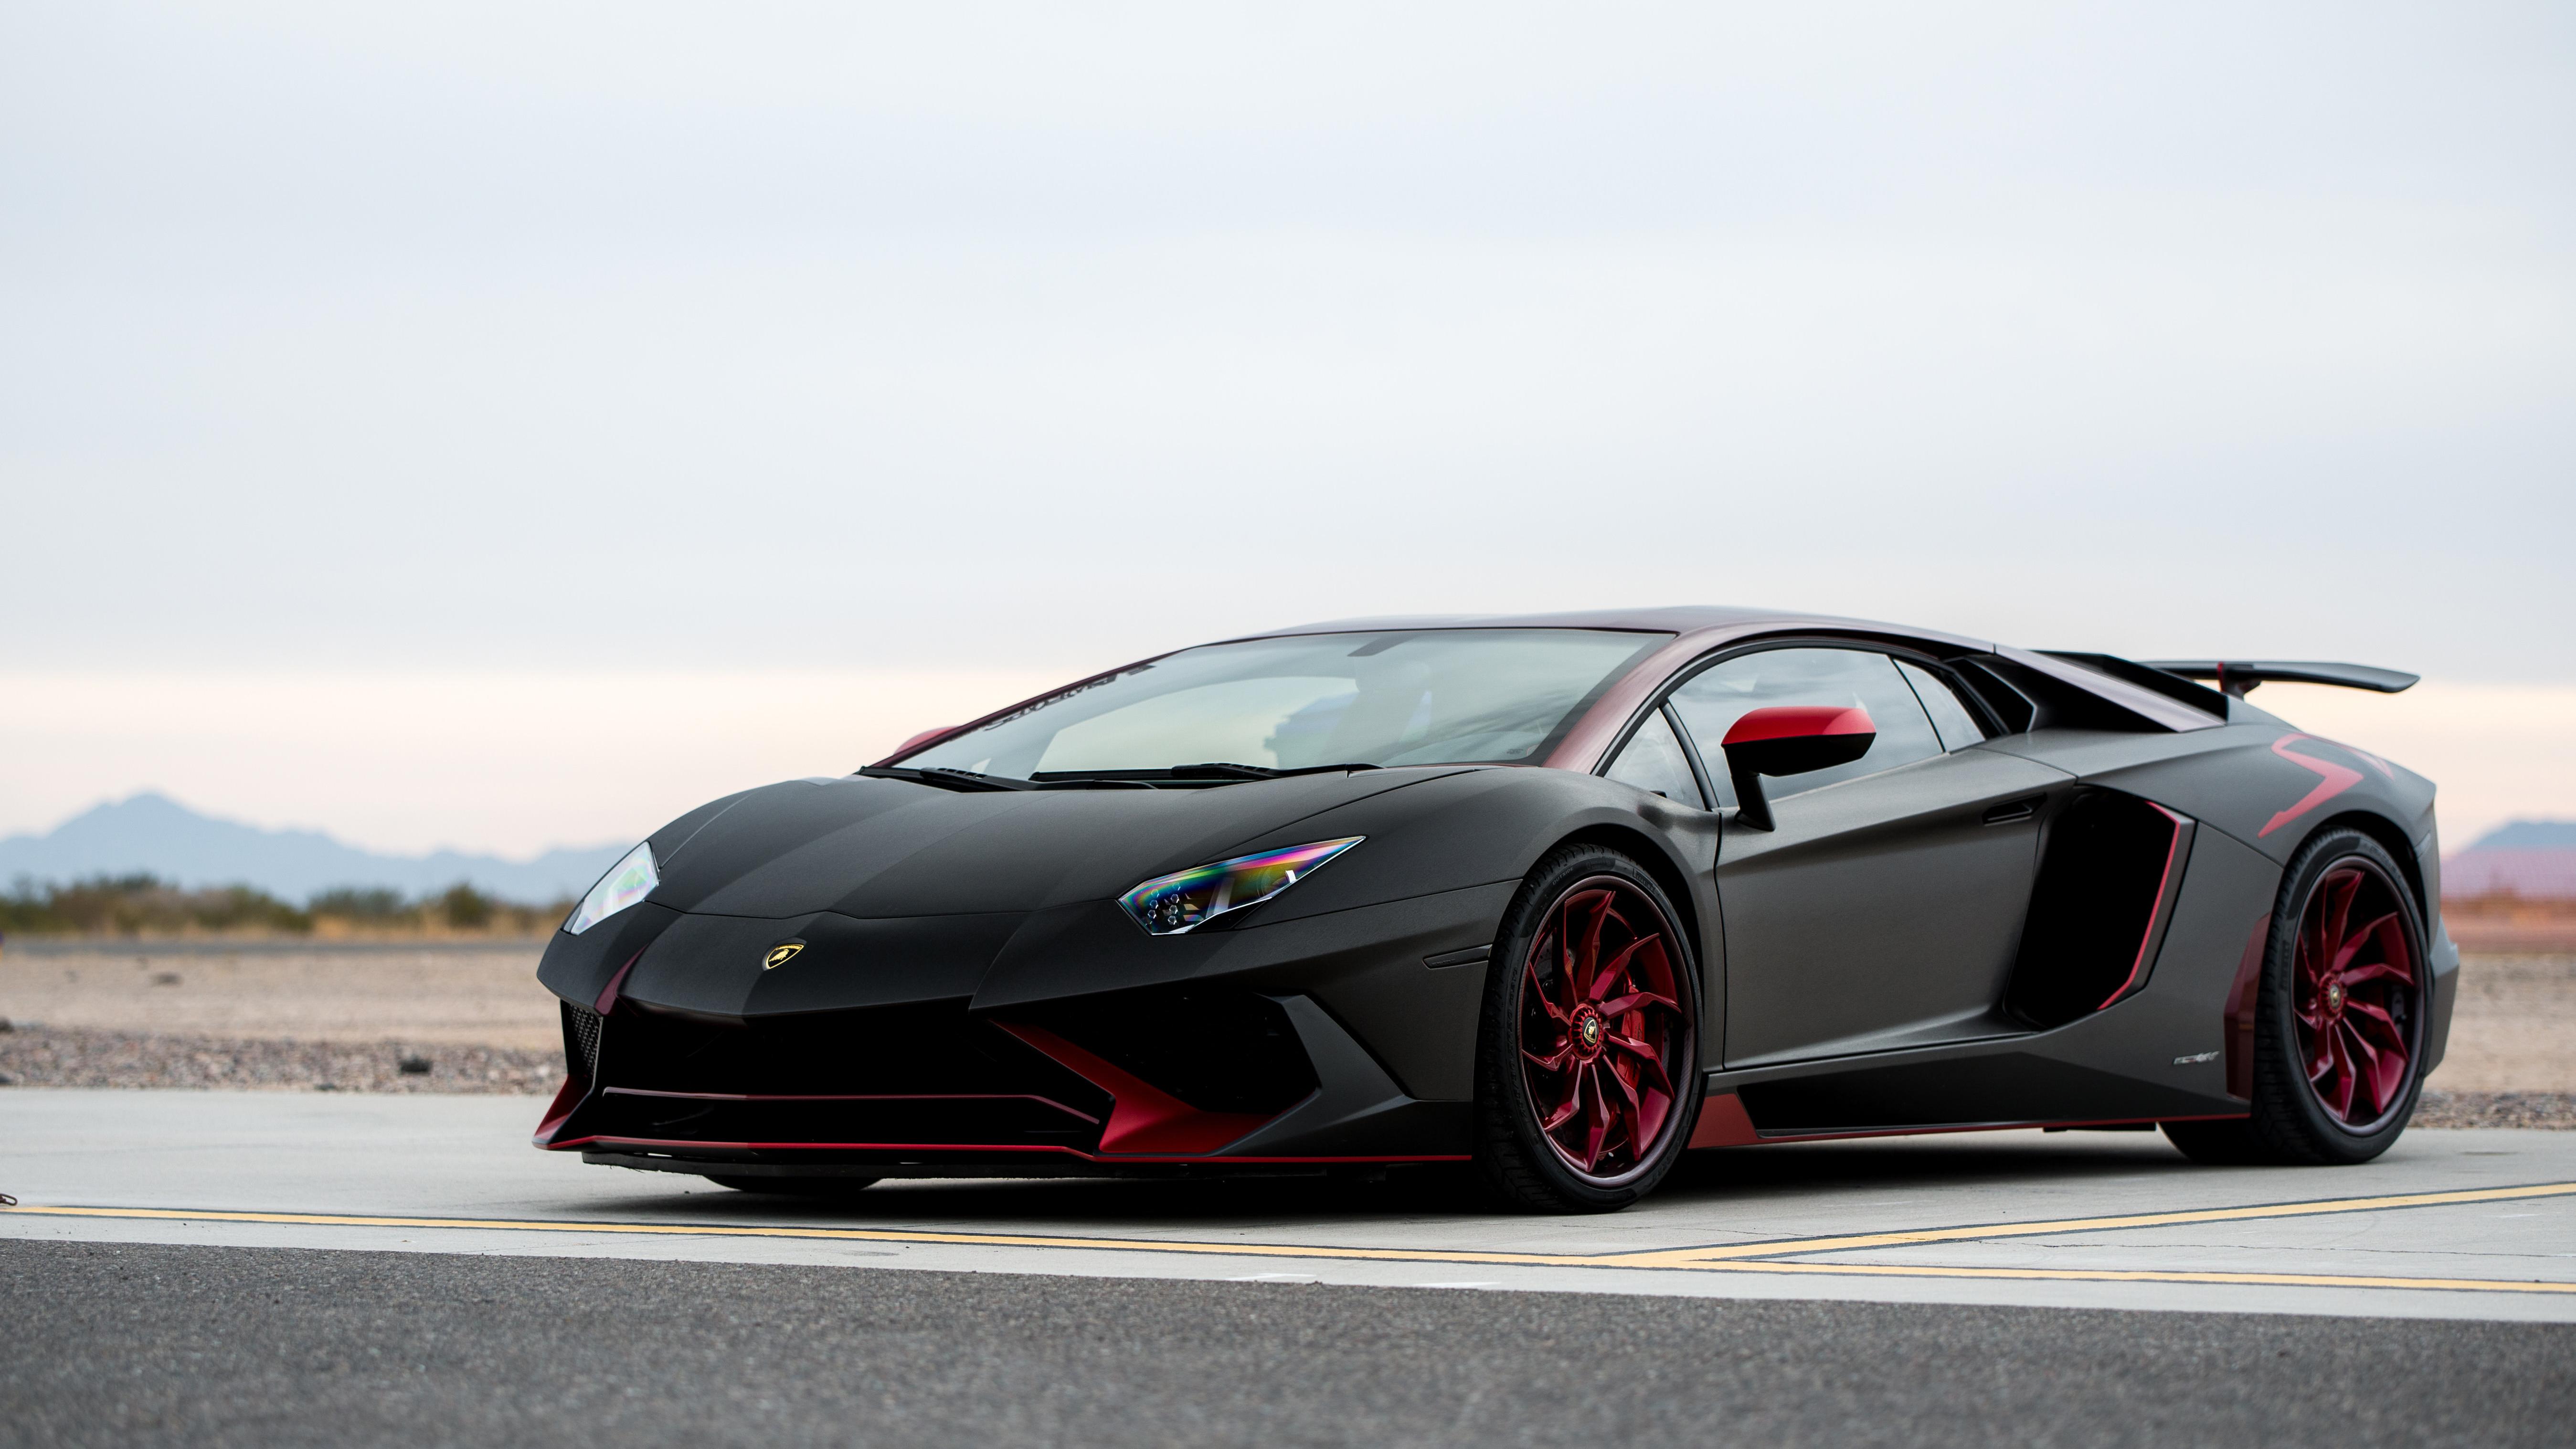 Lamborghini Aventador SV 4k, HD Cars, 4k Wallpapers